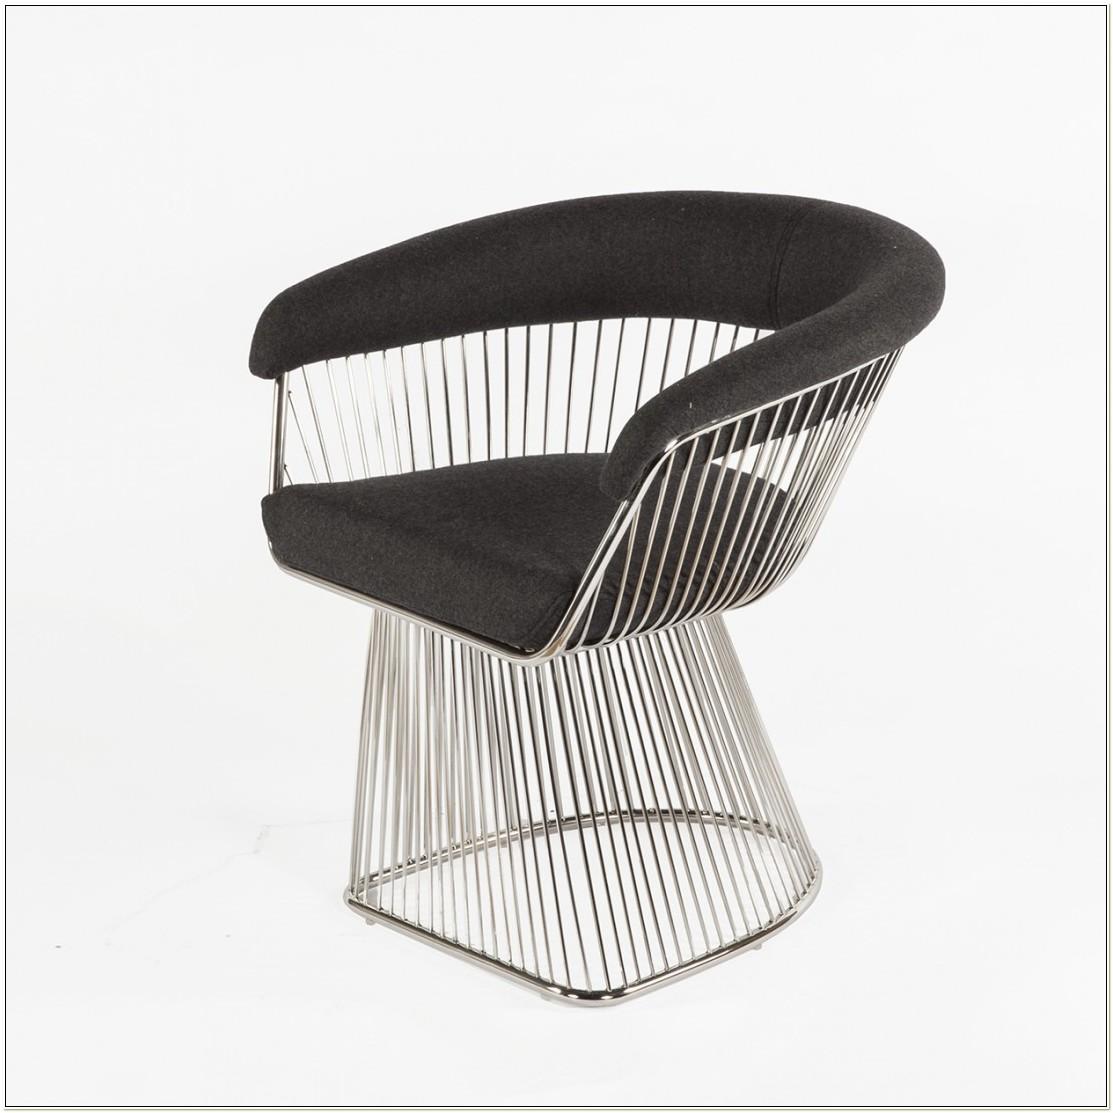 Platner Lounge Chair Replica Uk